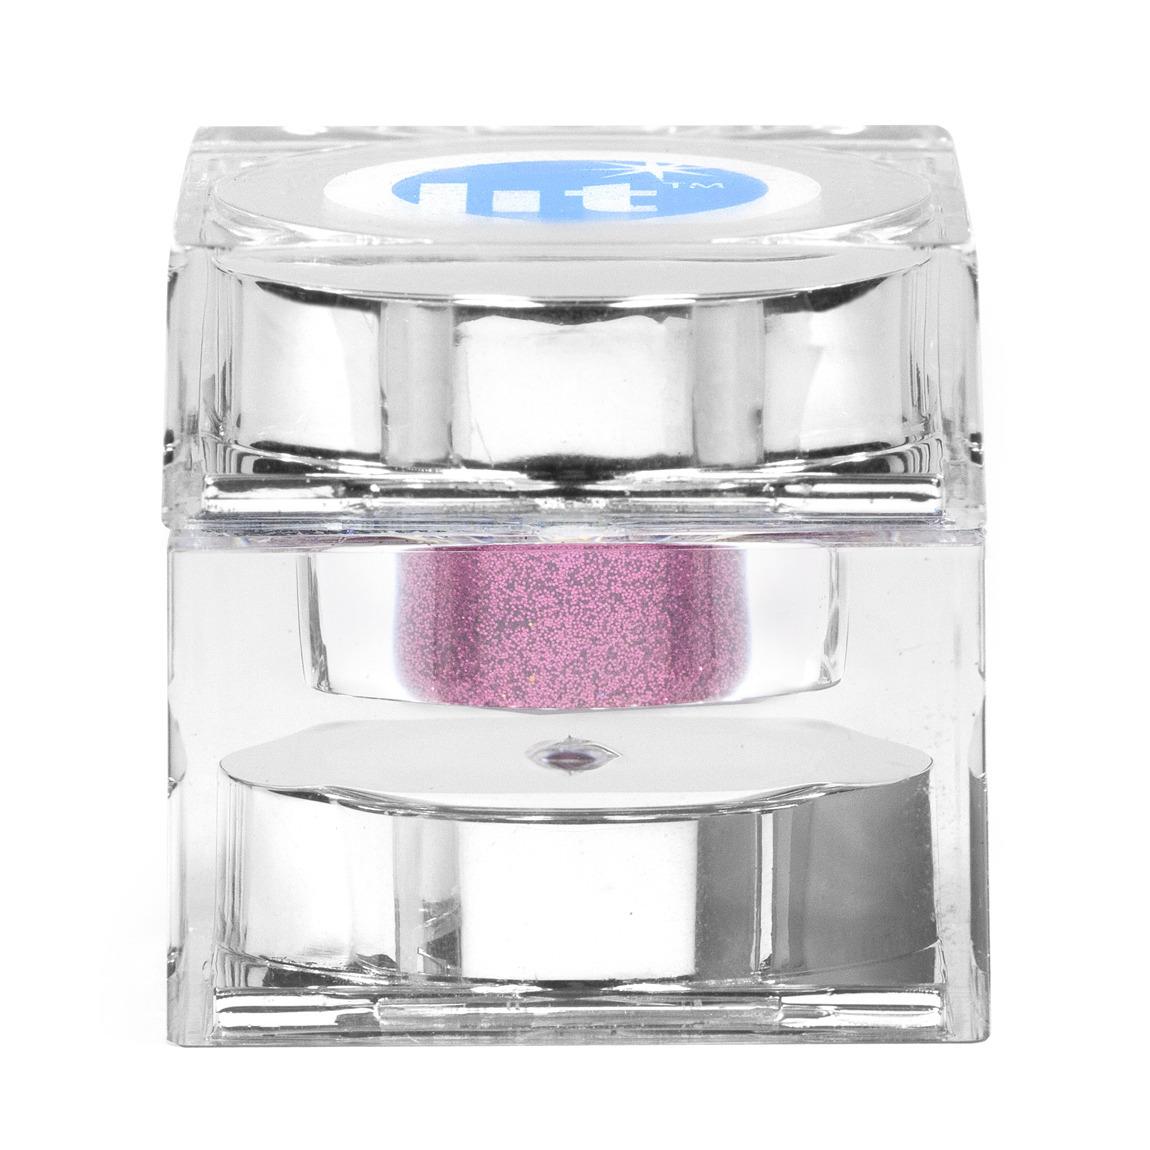 Lit Cosmetics Lit Glitter Roxy Rolla S2 (Solid) alternative view 1.